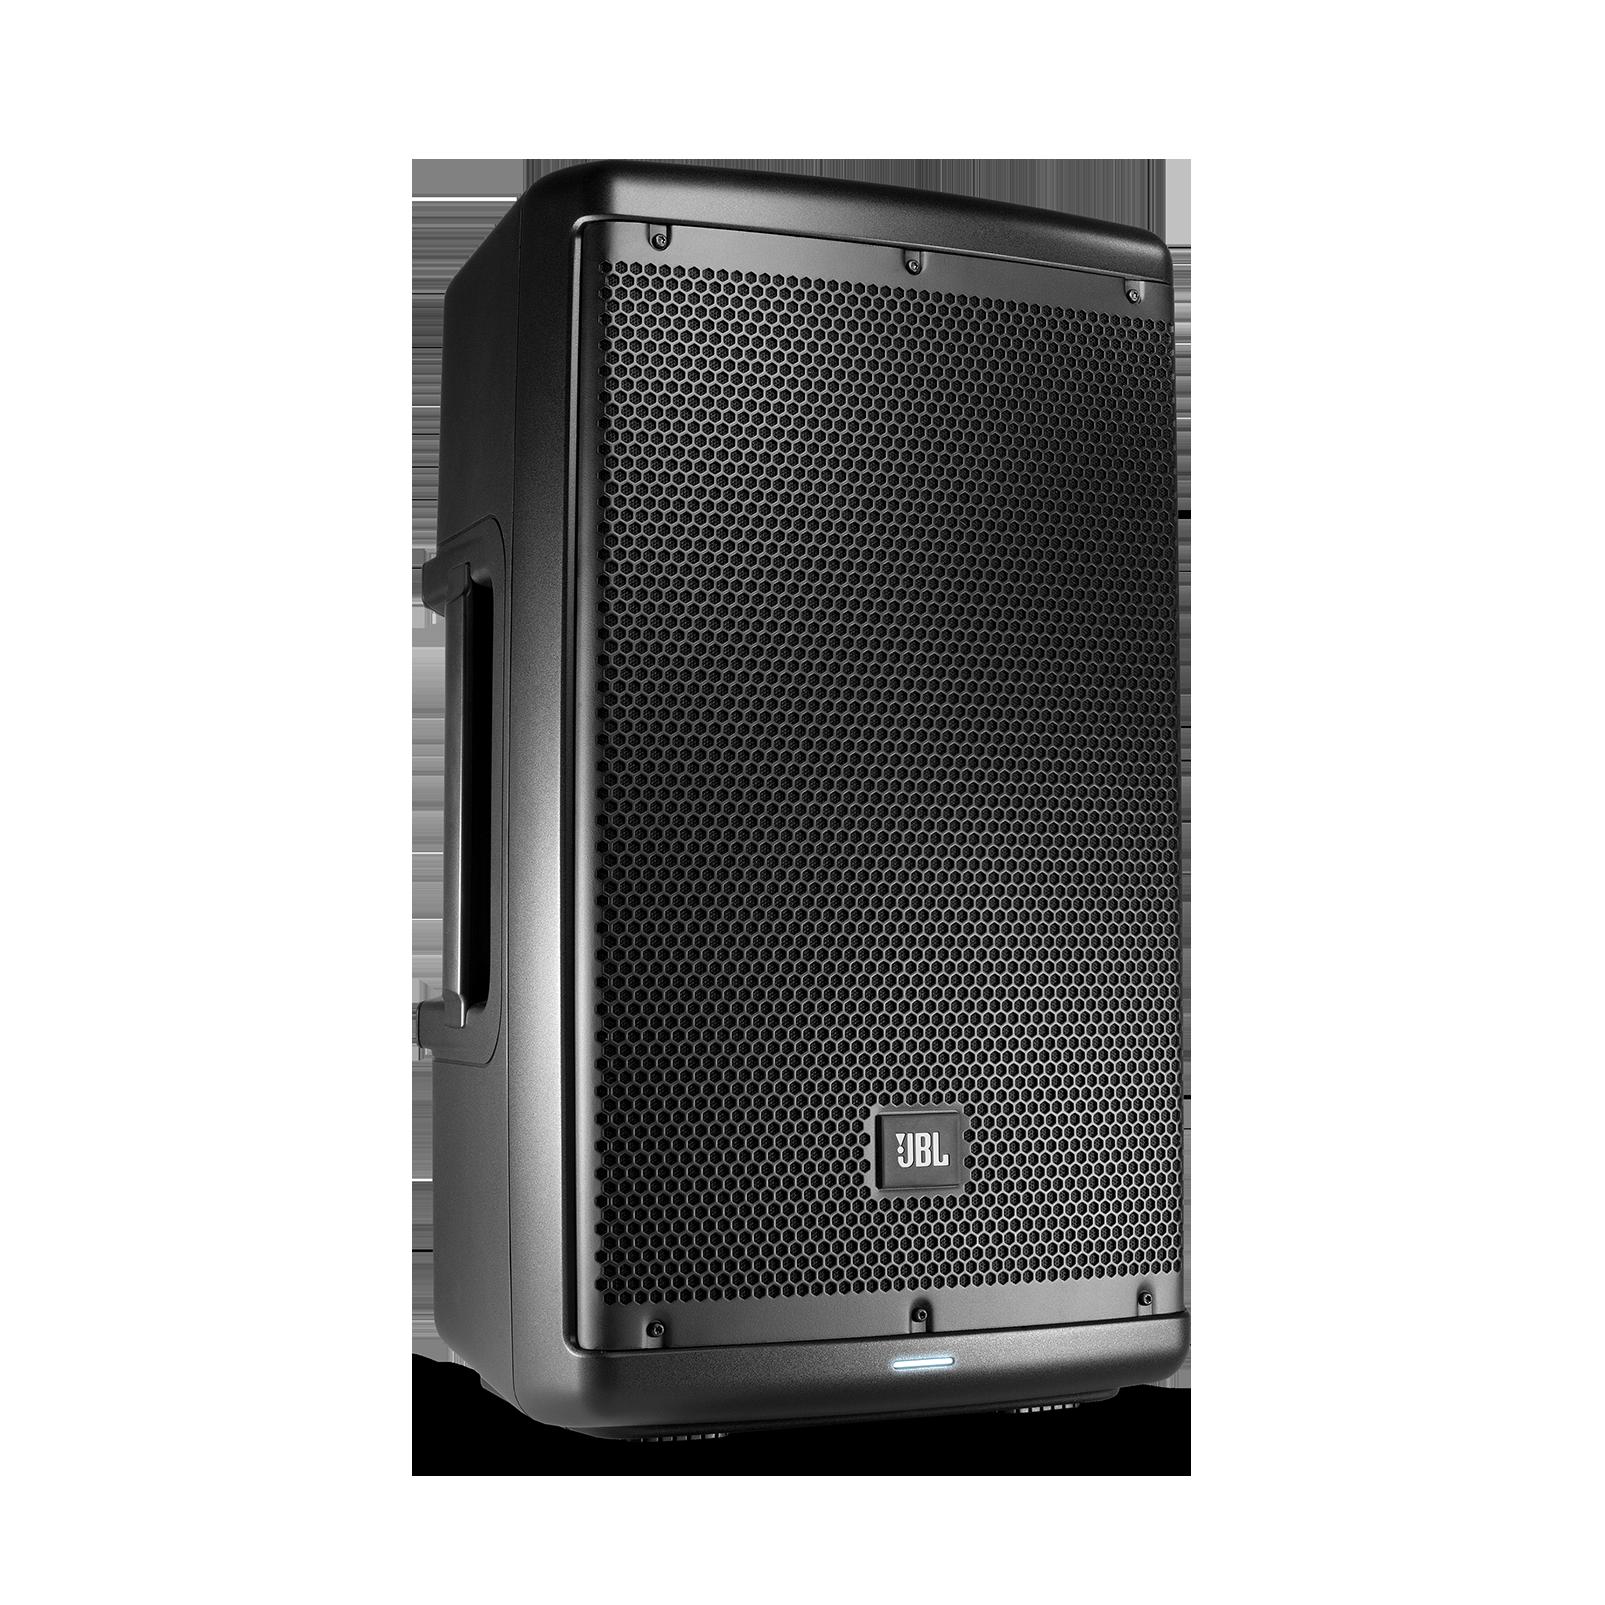 jbl eon610 10 two way multipurpose self powered sound reinforcement rh jbl com jbl eon g15 manual jbl eon 612 manual pdf